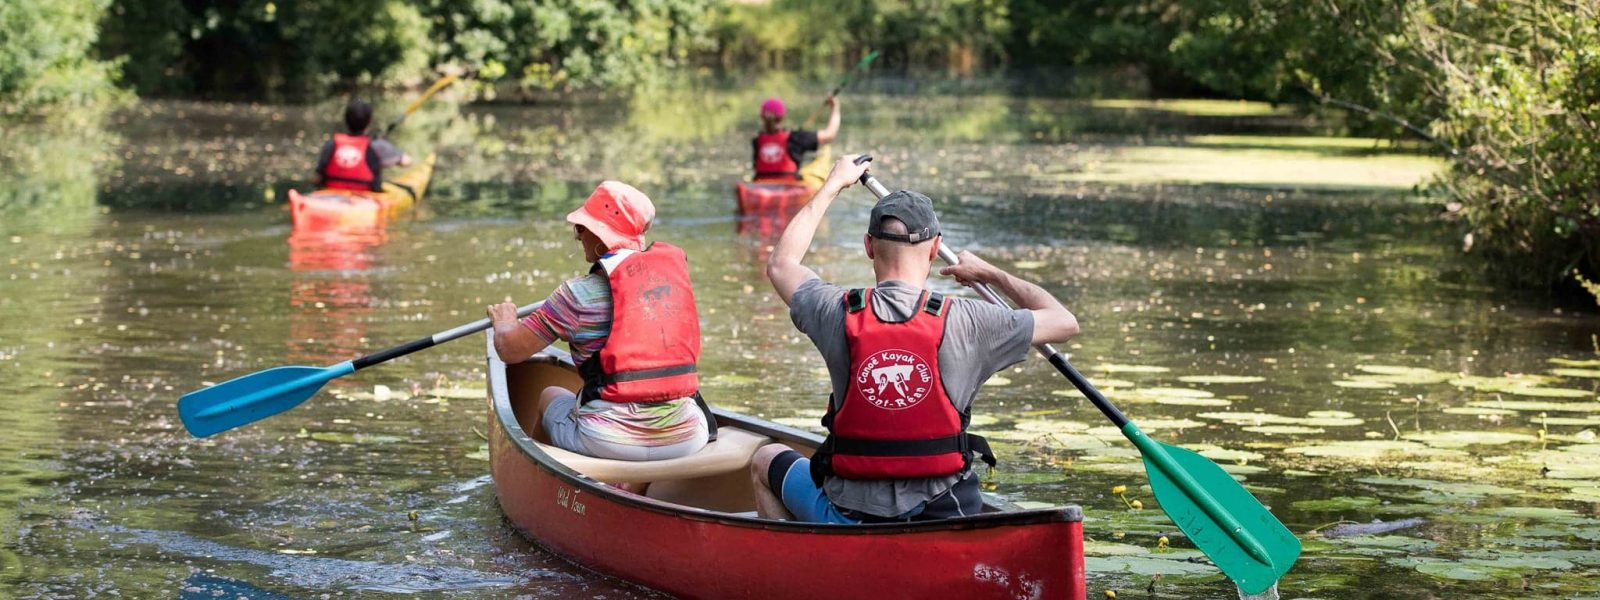 cano-kayak-club-pont-rean-8074